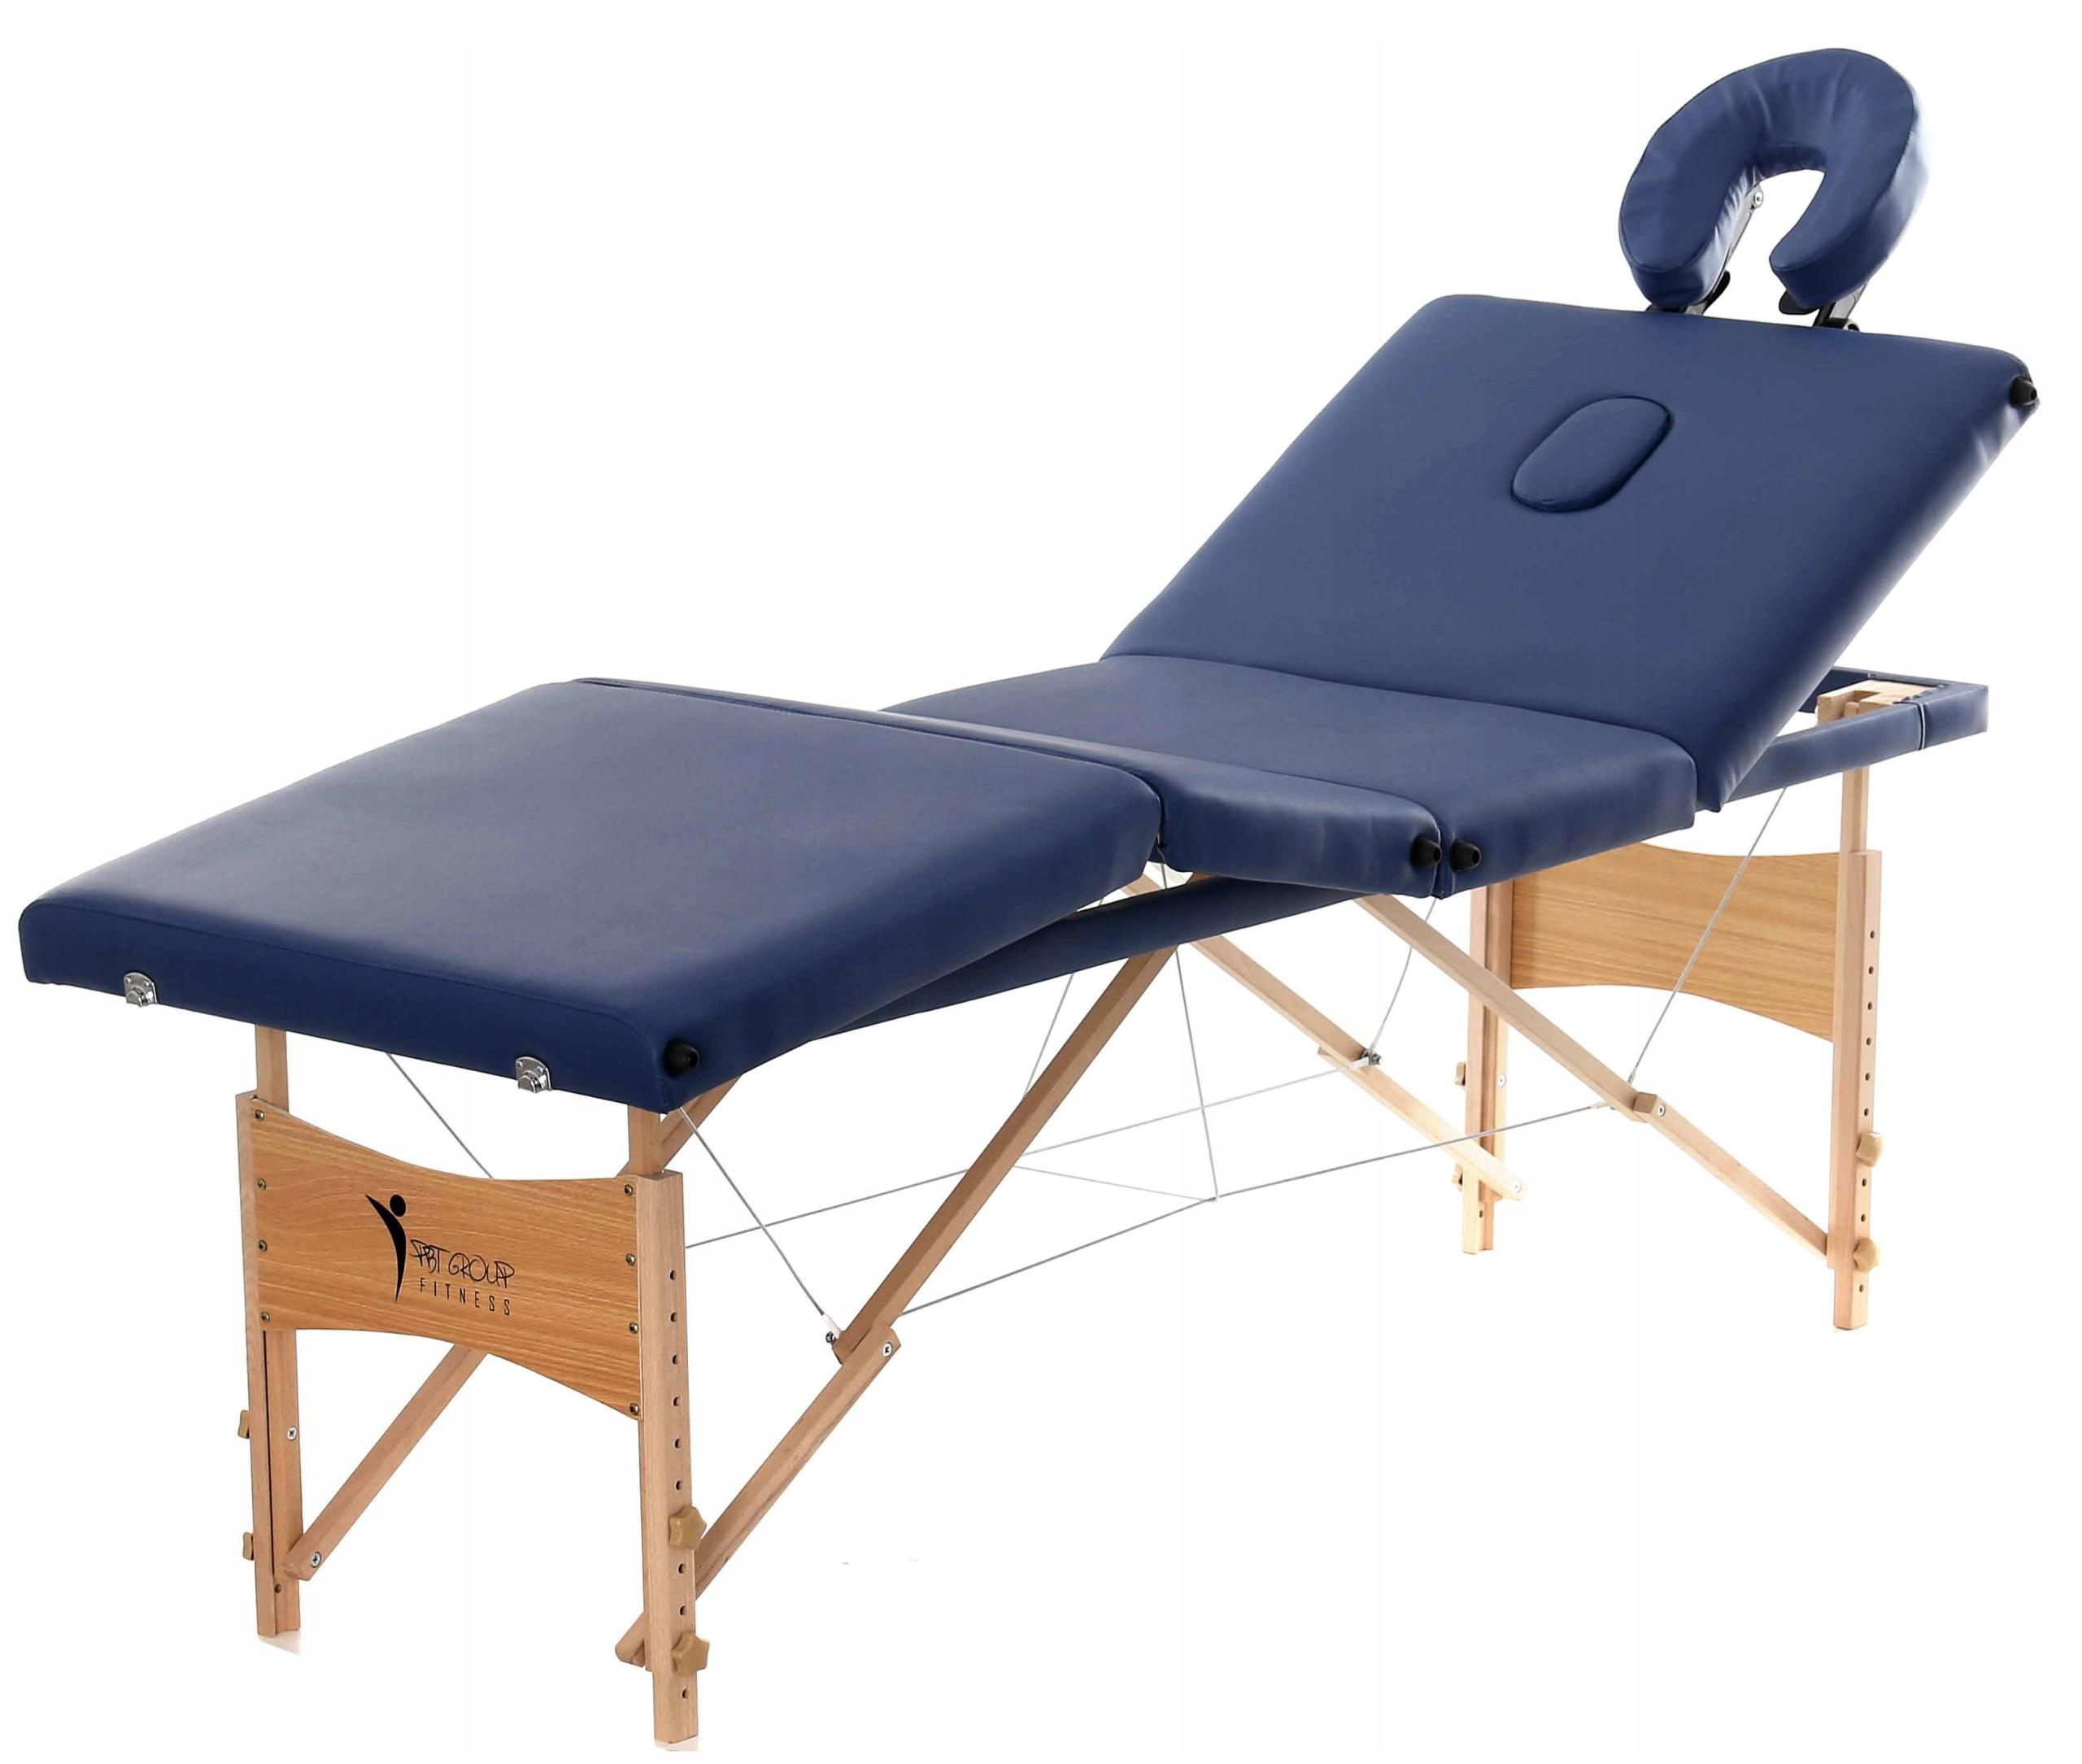 Stol Lozko Do Masazu Drewniane 4 Segmentowe Kolory 8080062903 Allegro Pl